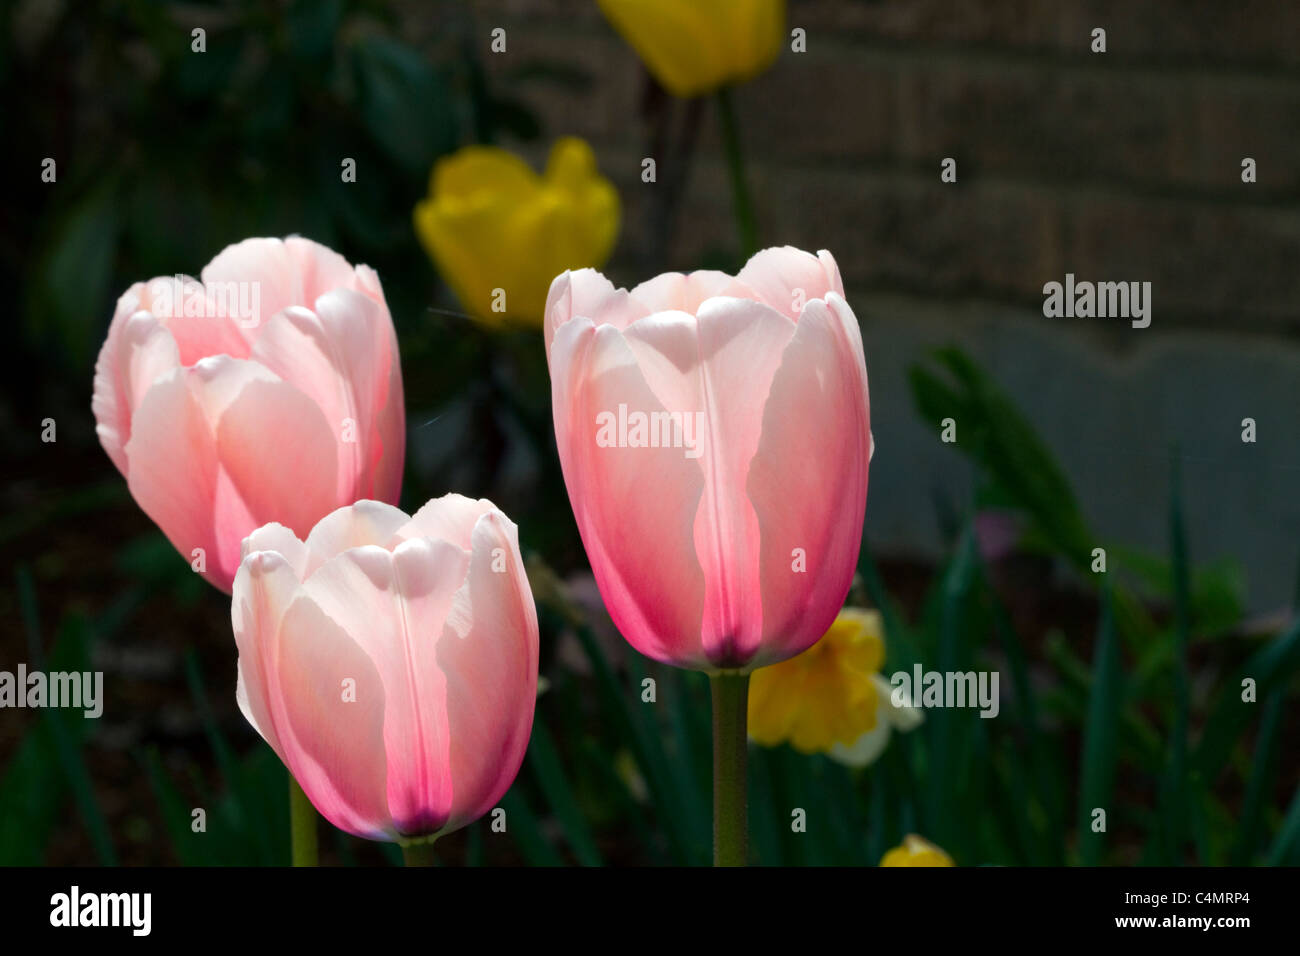 Tulip flower in bloom. Stock Photo